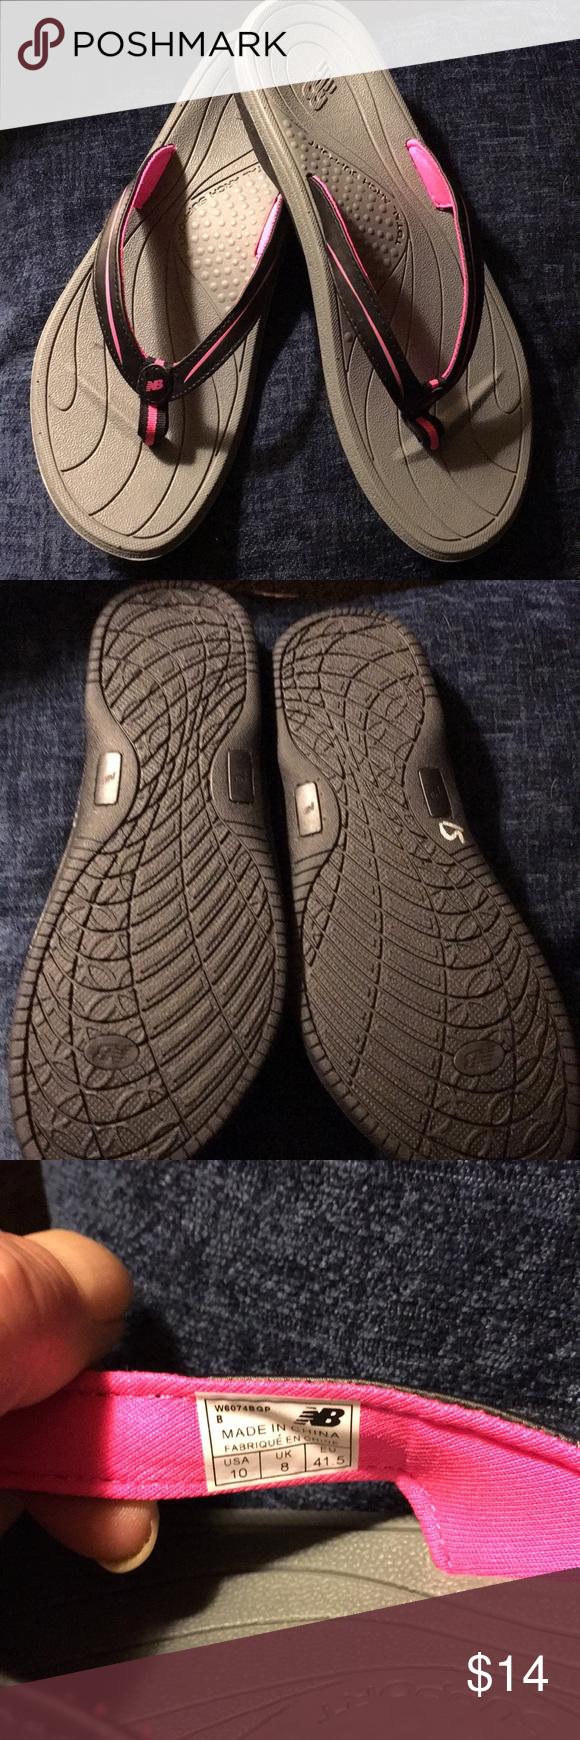 2494bcb887e New Balance flip flops sz 10 Nwot pink n black arch support Cush sole size  woman s 10 New Balance Shoes Sandals